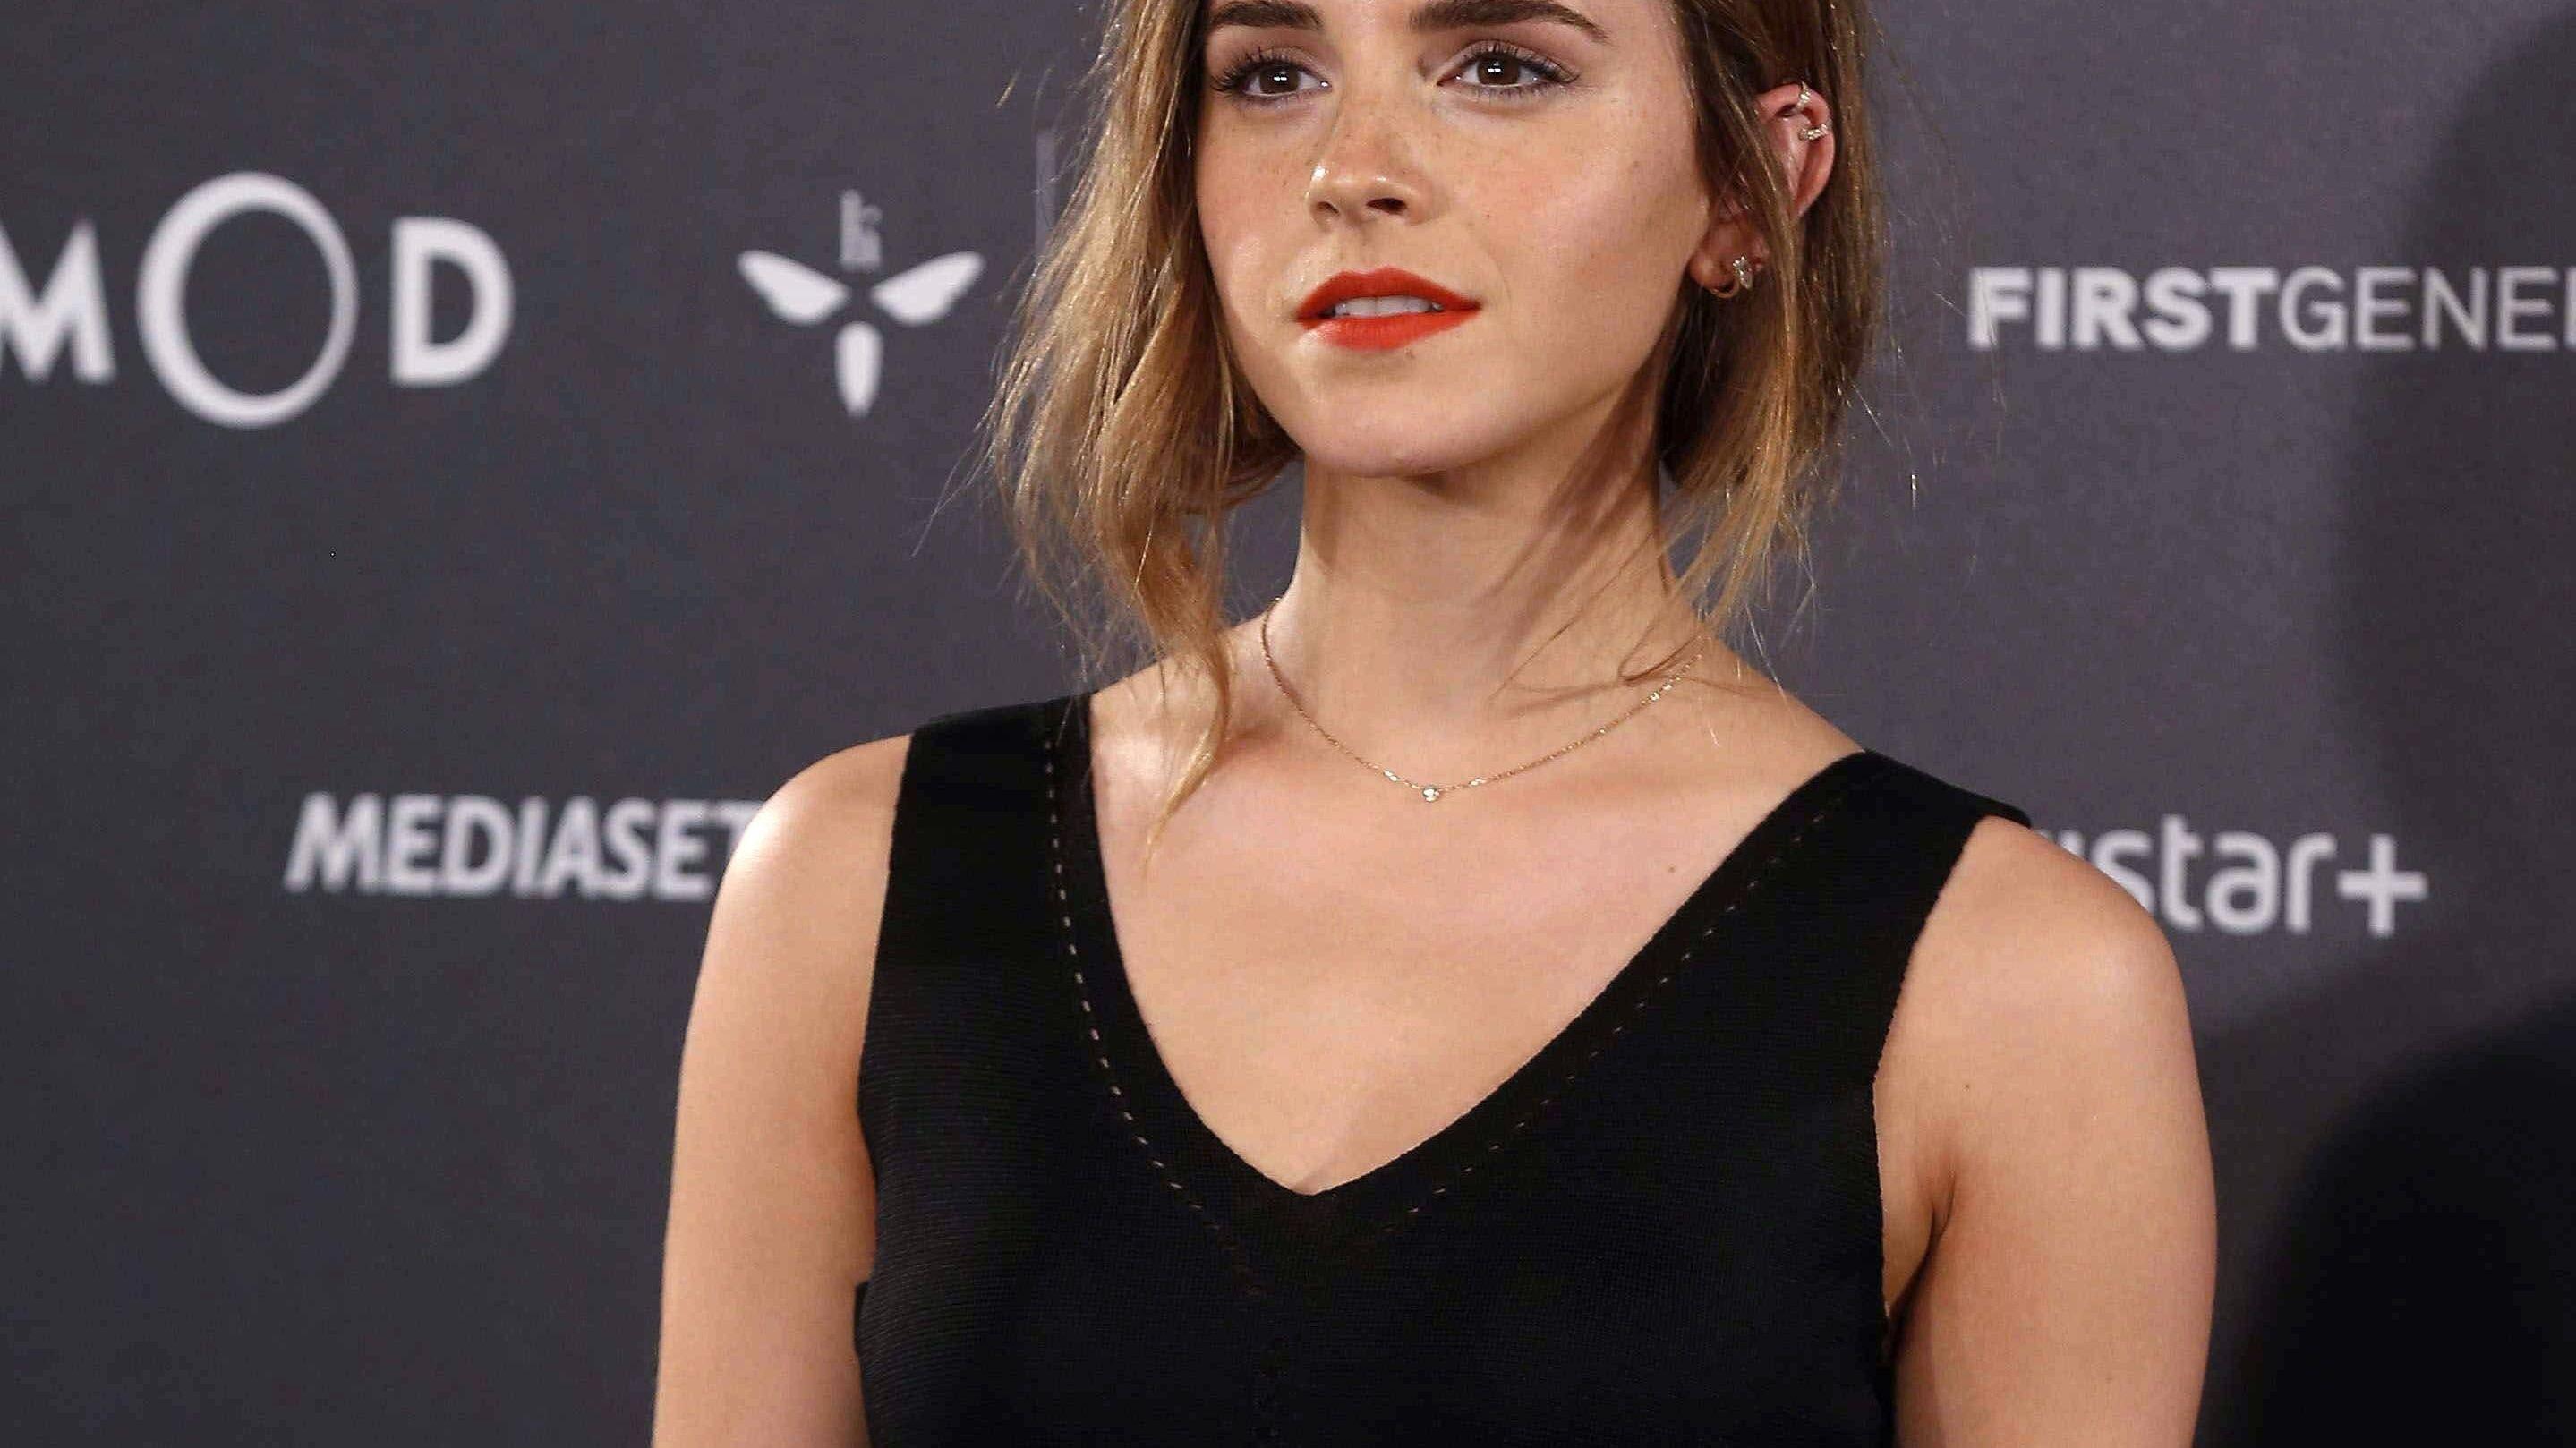 Emma Watson photos leak: Actress plans legal action over